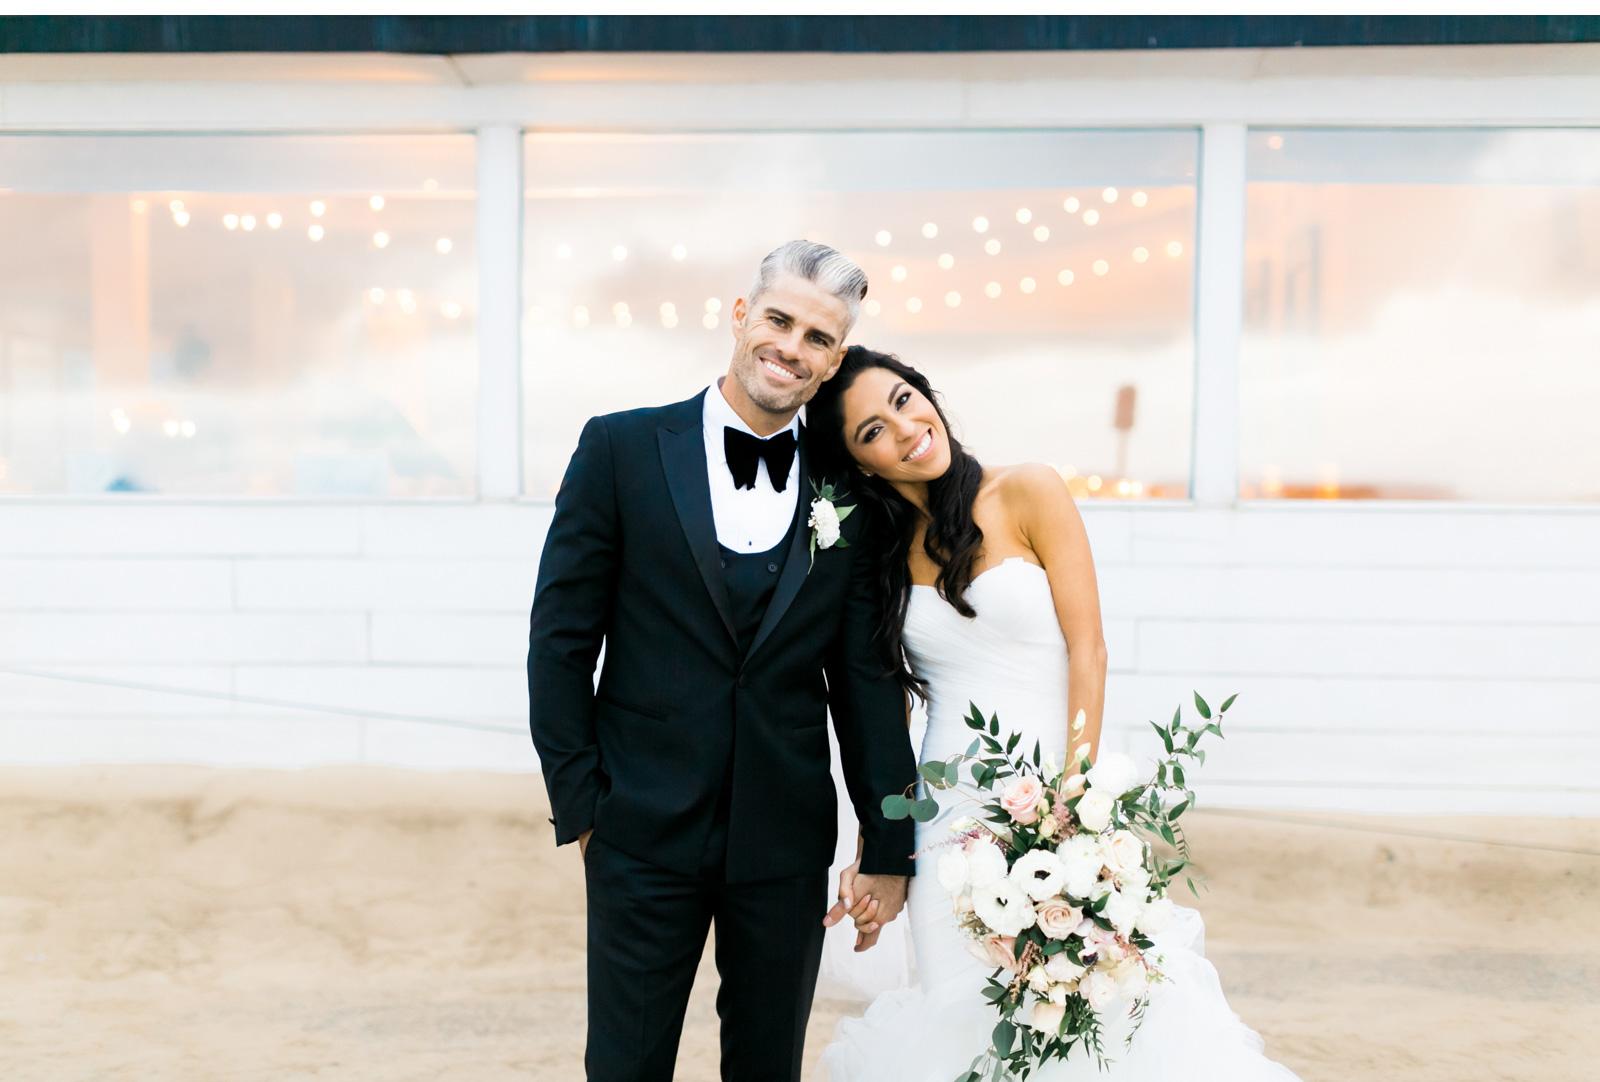 Style-Me-Pretty-Malibu-Beach-CA-Wedding-Natalie-Schutt-Photography_08.jpg